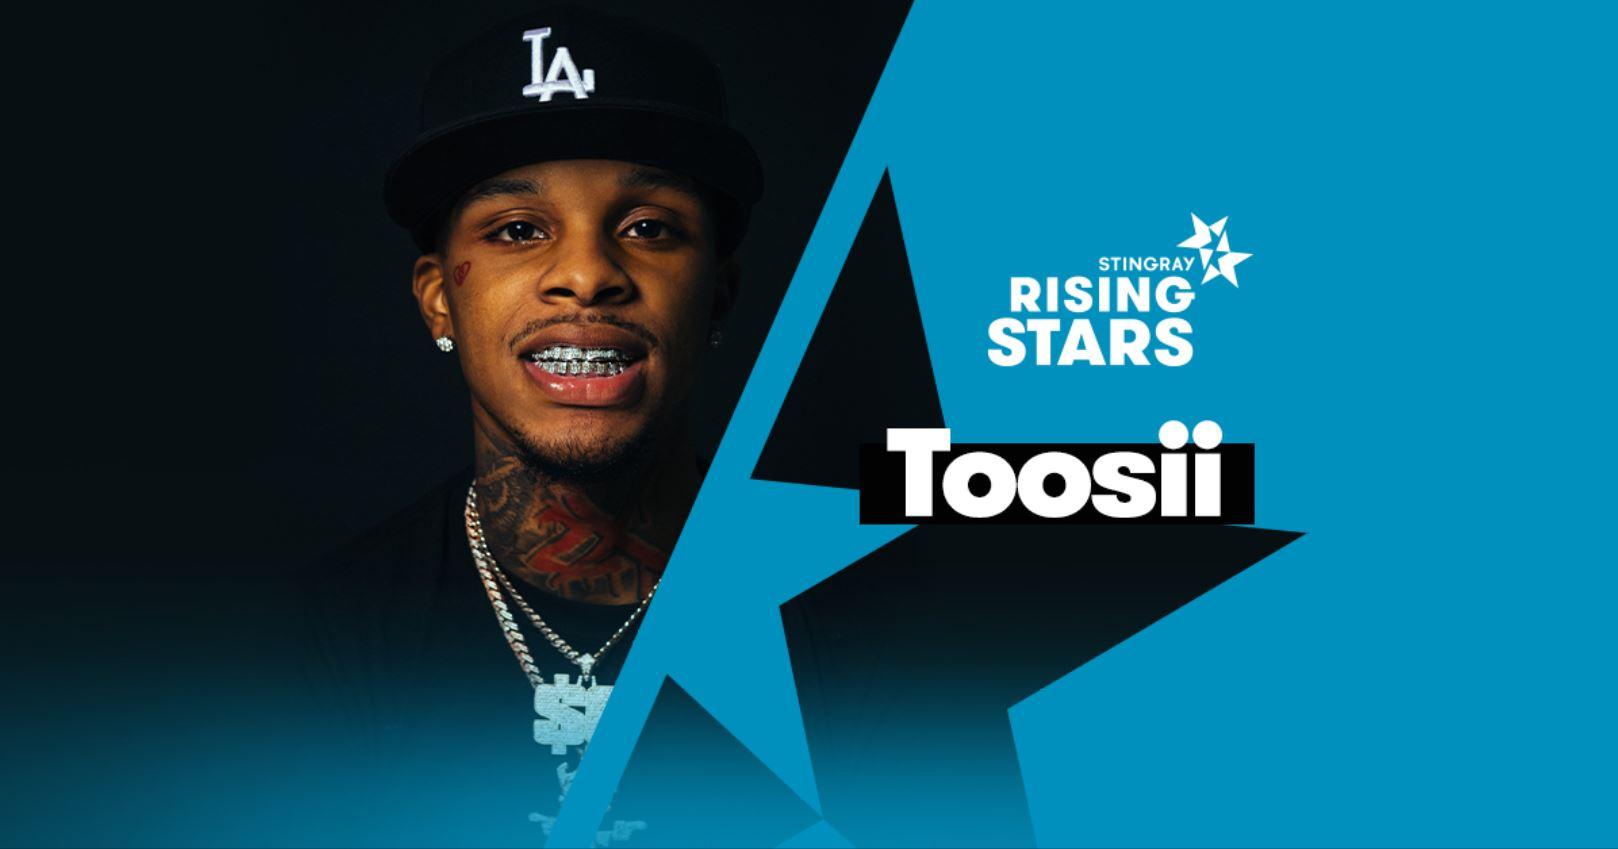 toosii interview stingray rising stars